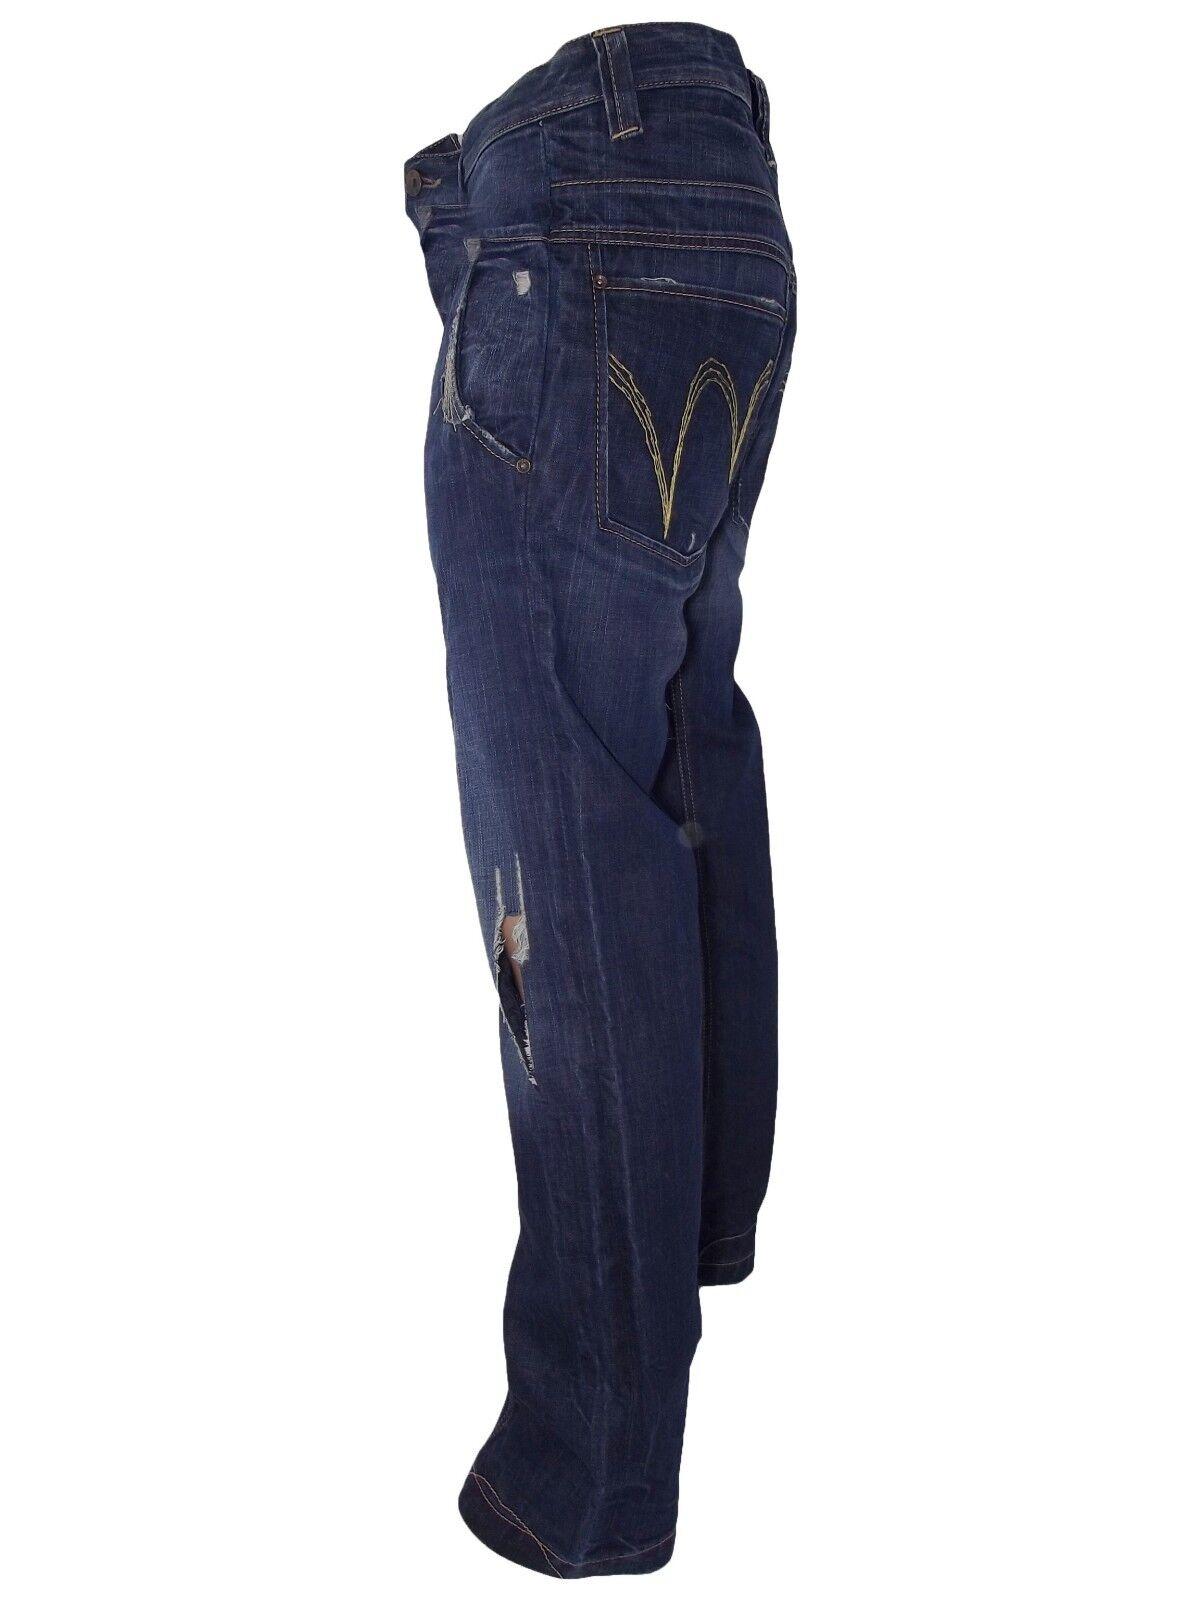 Jeans Denim Met 47 W Uomo It Blu Taglia Italy Dritto 33 Made sQCrthdx